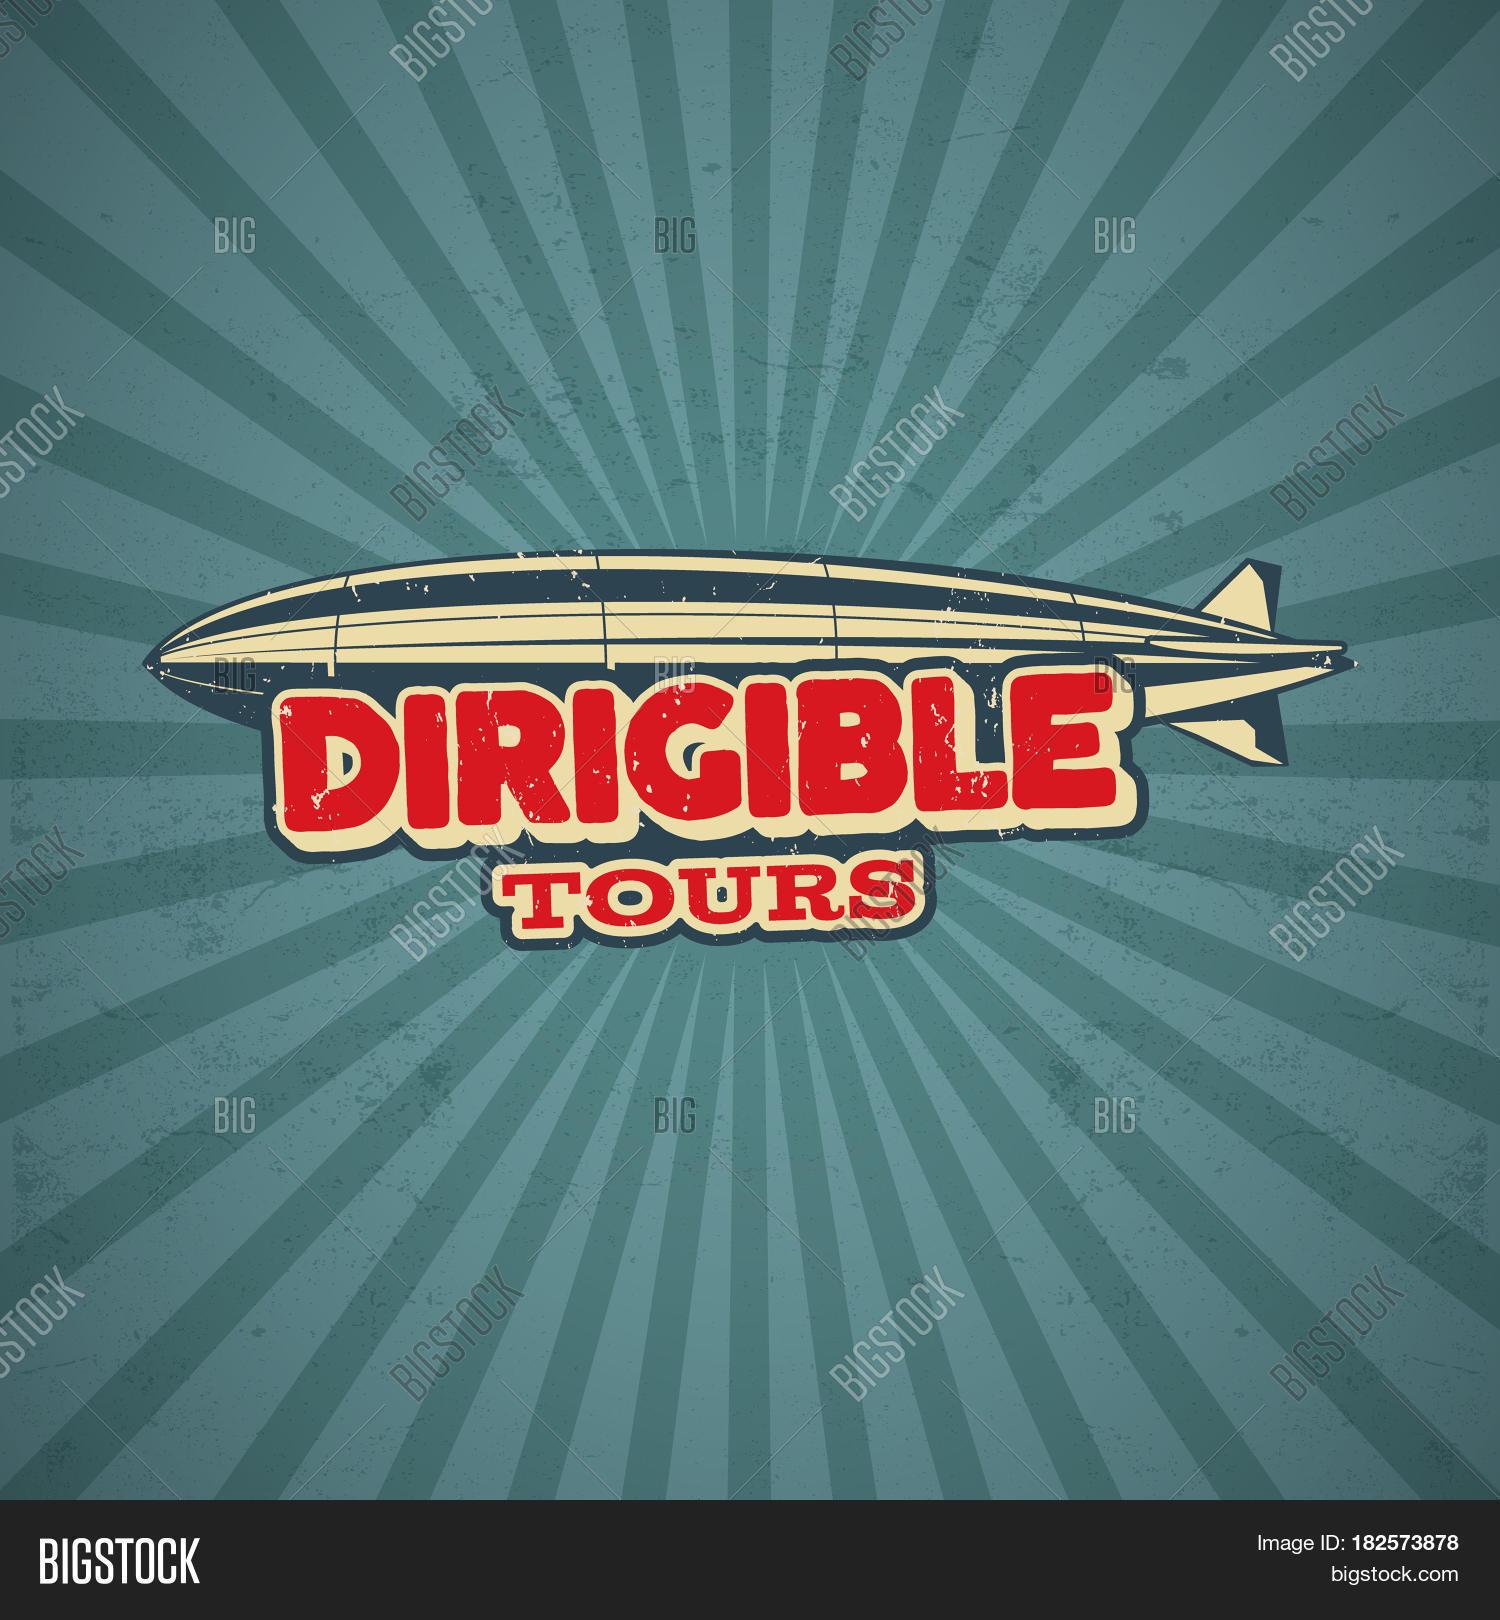 Poster design 50s - Vintage Airship Poster Design Retro Dirigible 50s Poster Airplane Label Design Old Sketching